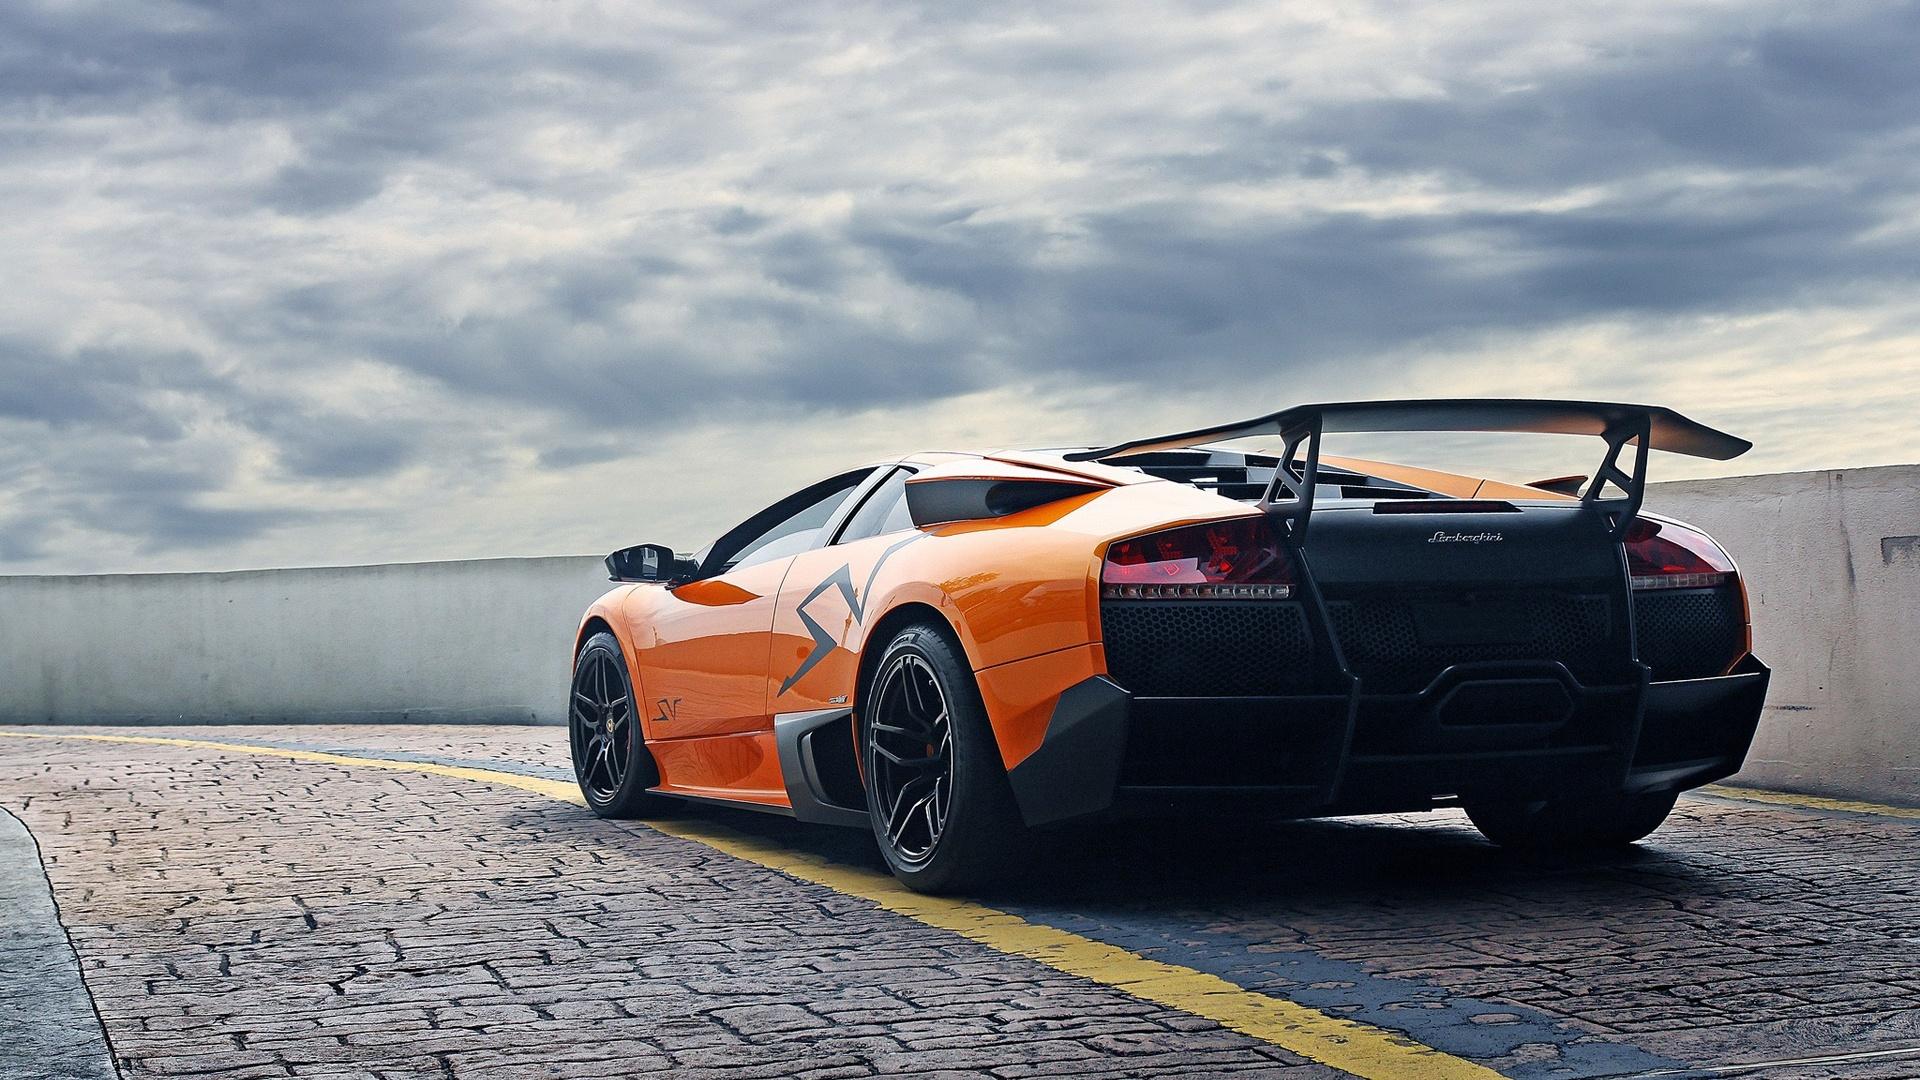 Wallpaper Lamborghini Murcielago Lp670 4 Sv Orange Supercar 1920x1200 Hd Picture Image